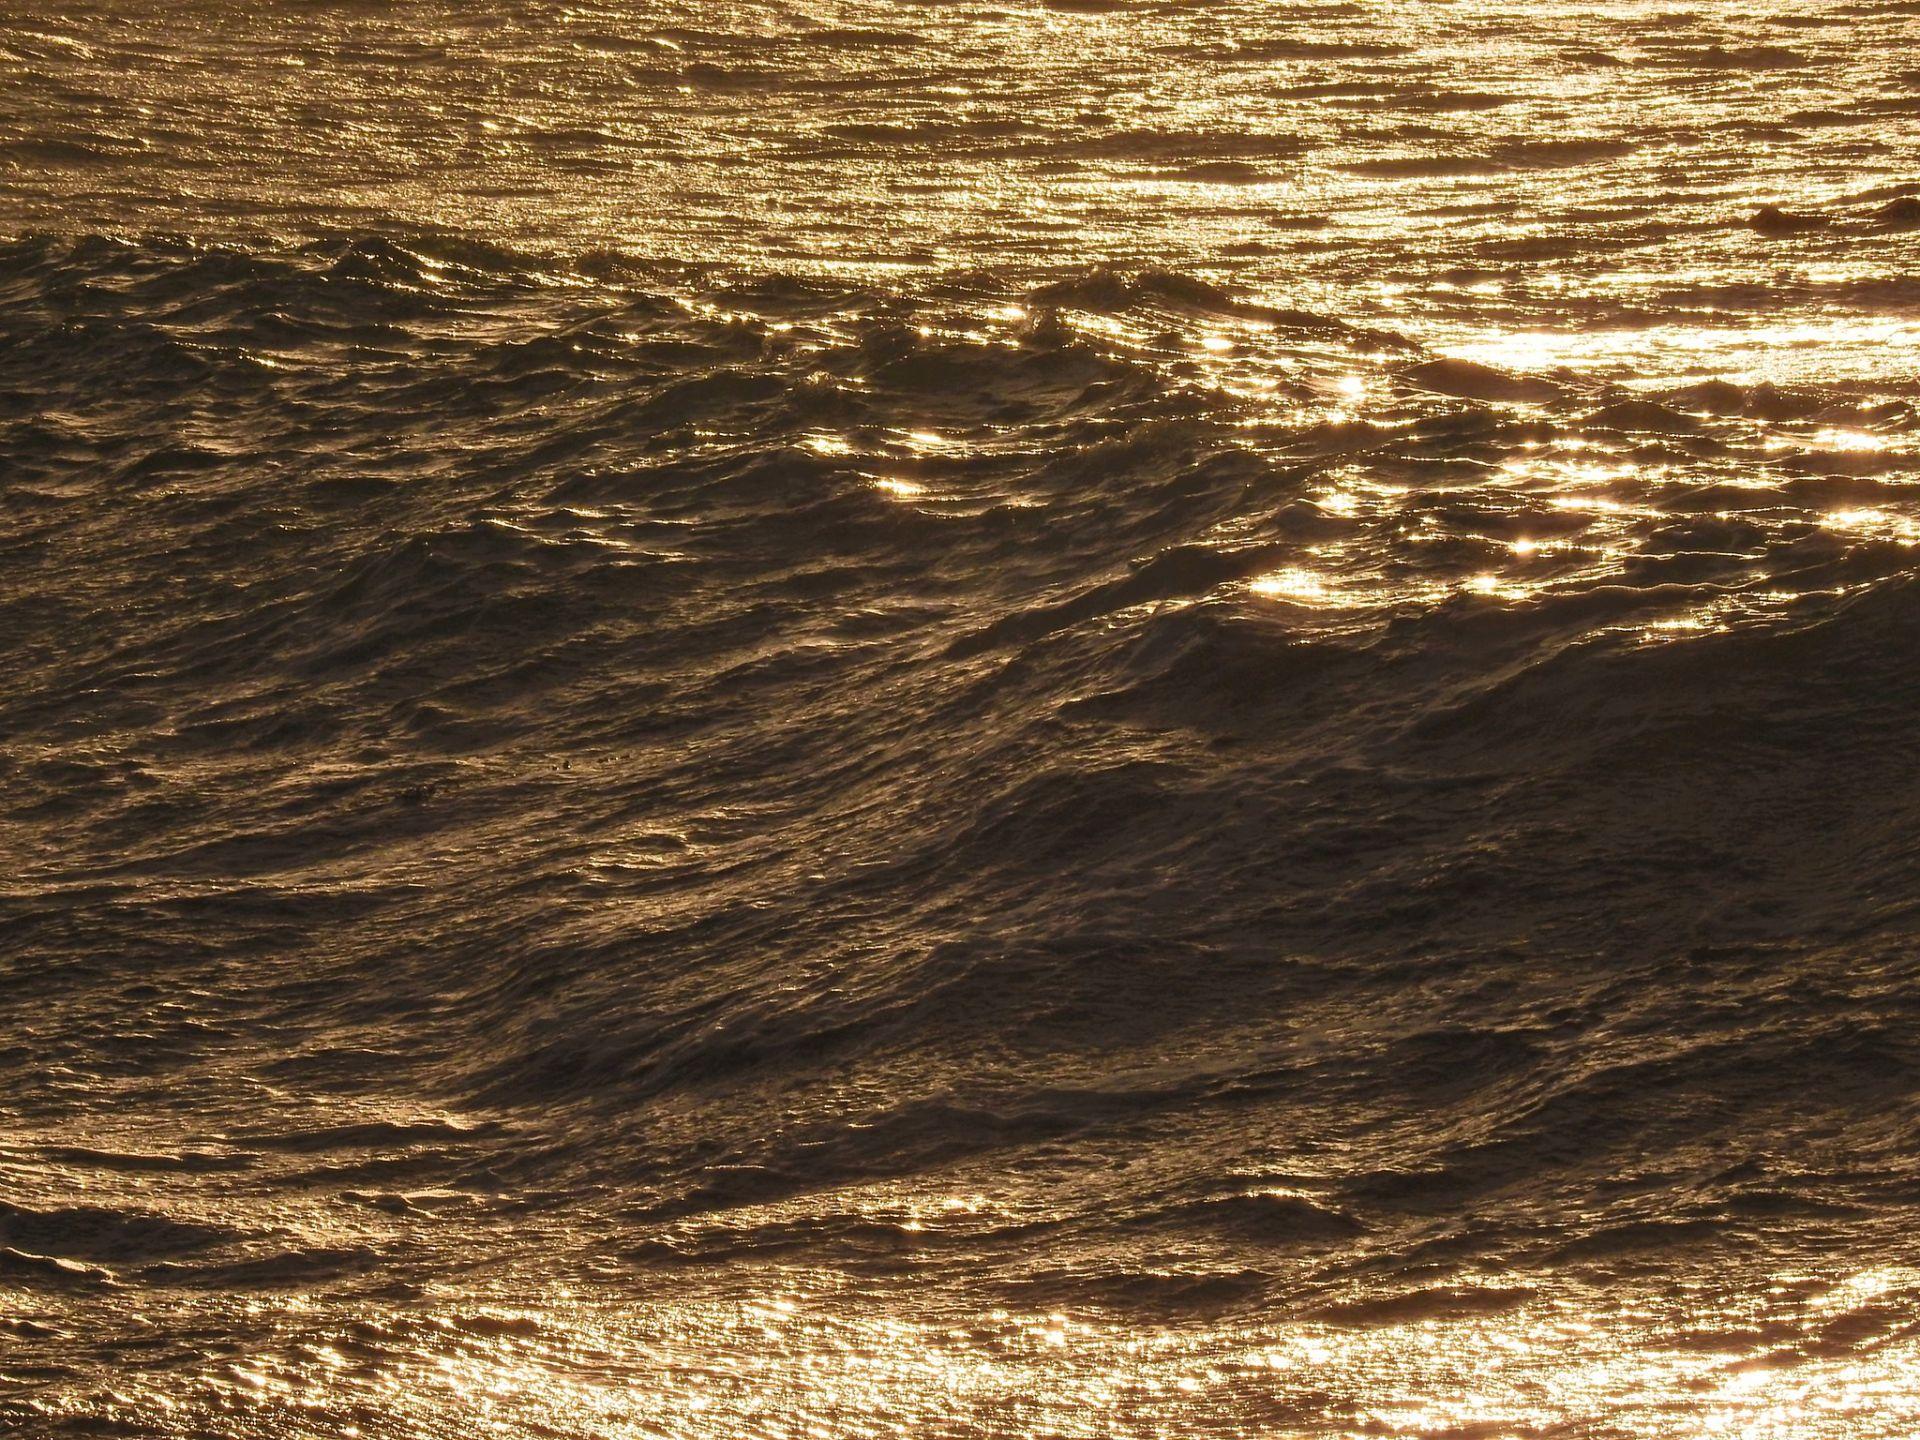 soleil couchant, bord de mer, bretagne